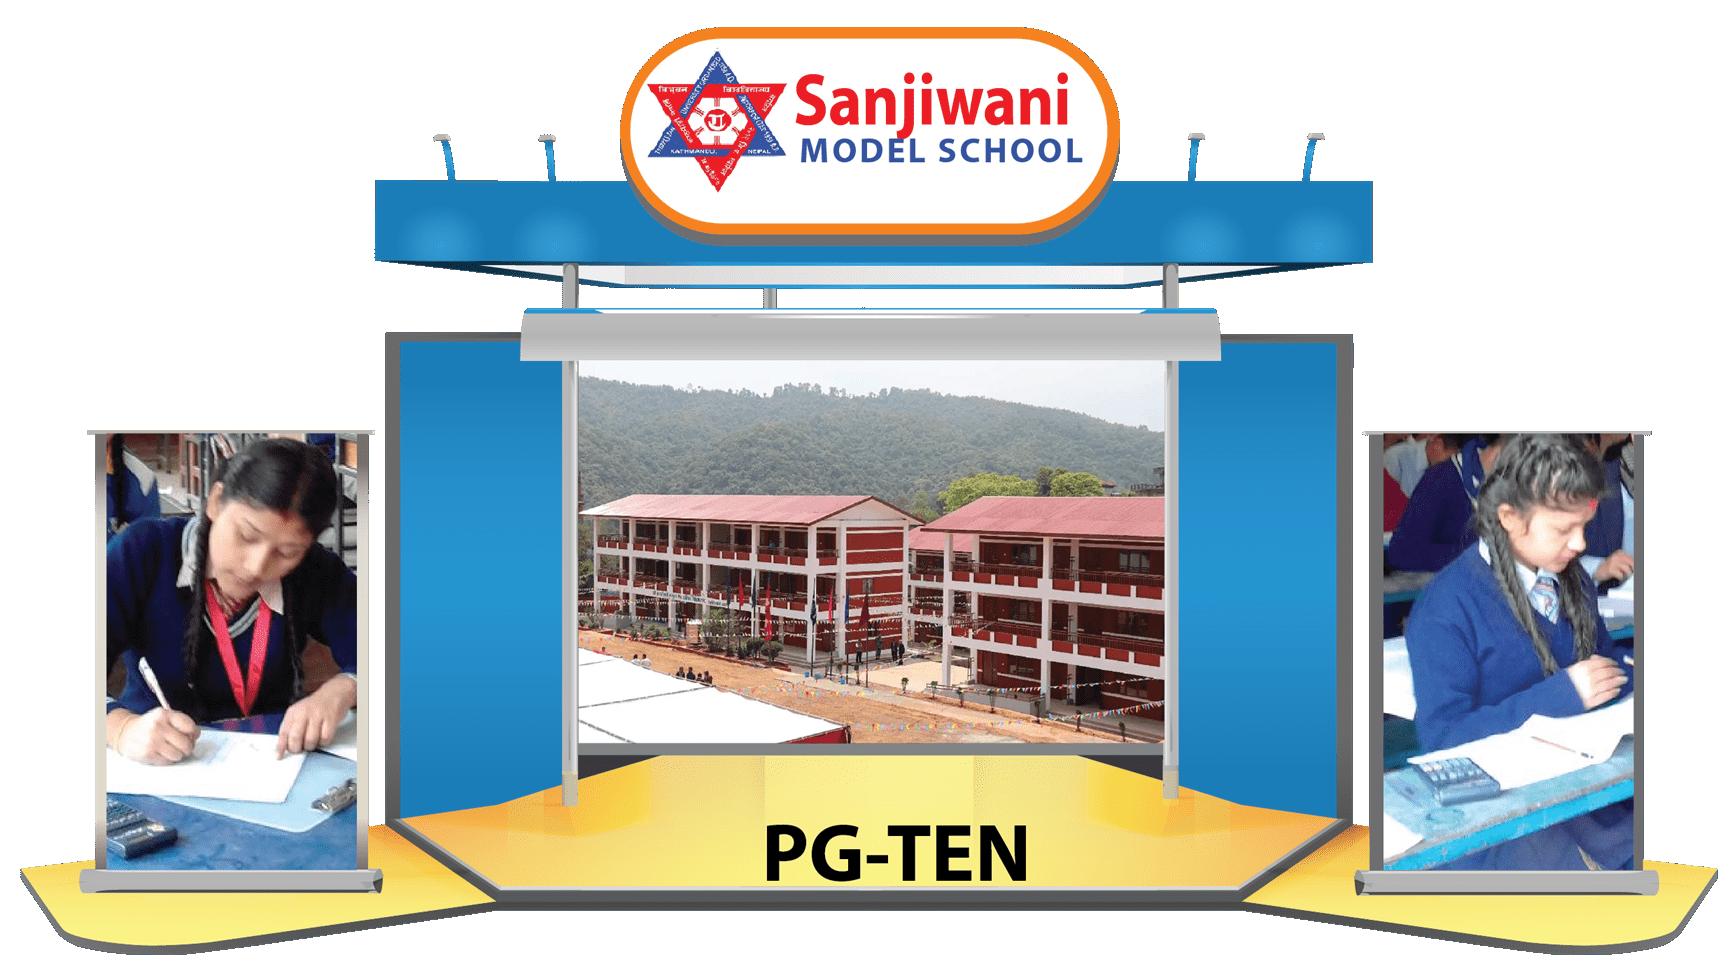 Sanjiwani Secondary School